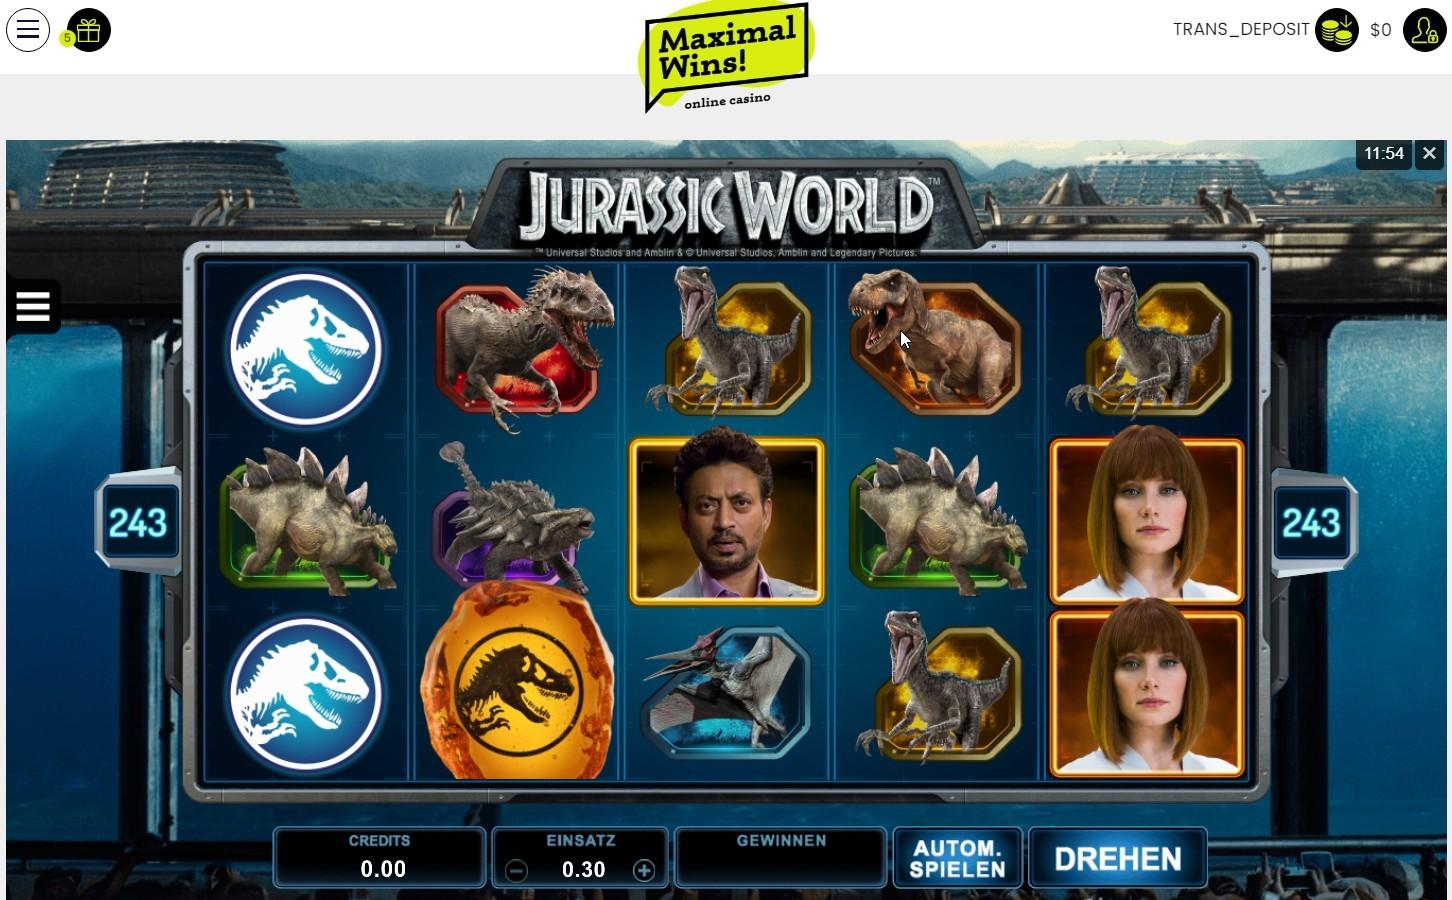 maximalWins_hottop_casino_Jurassic_Park